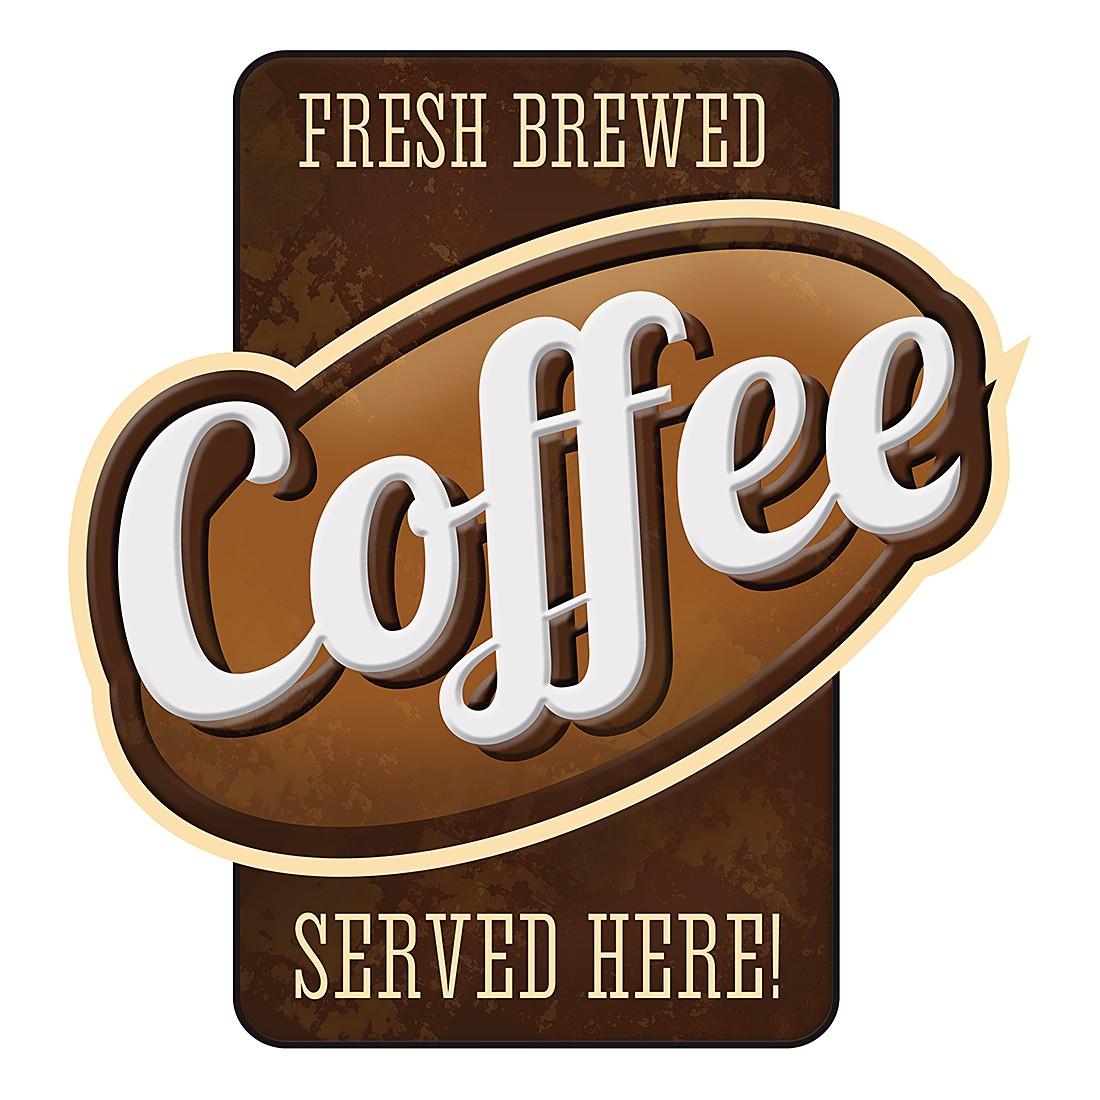 Wandbild Coffee served here, Pro Art online bestellen